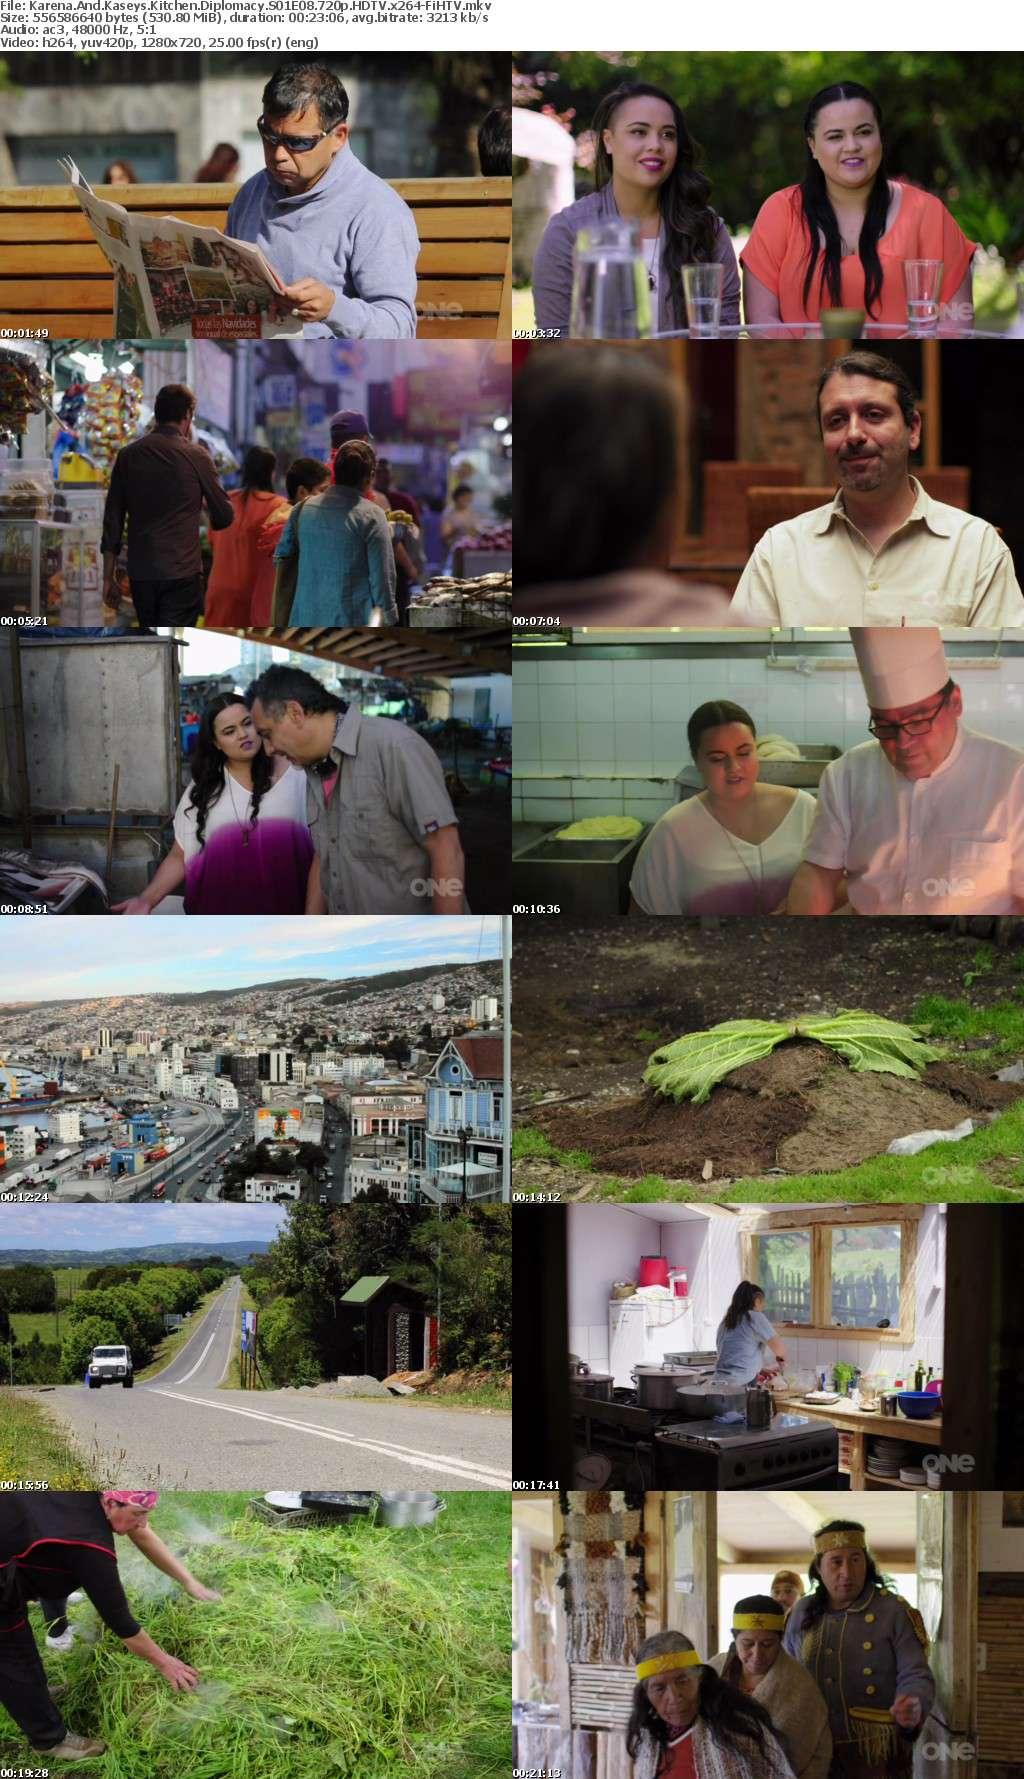 Karena And Kaseys Kitchen Diplomacy S01E08 720p HDTV x264-FiHTV